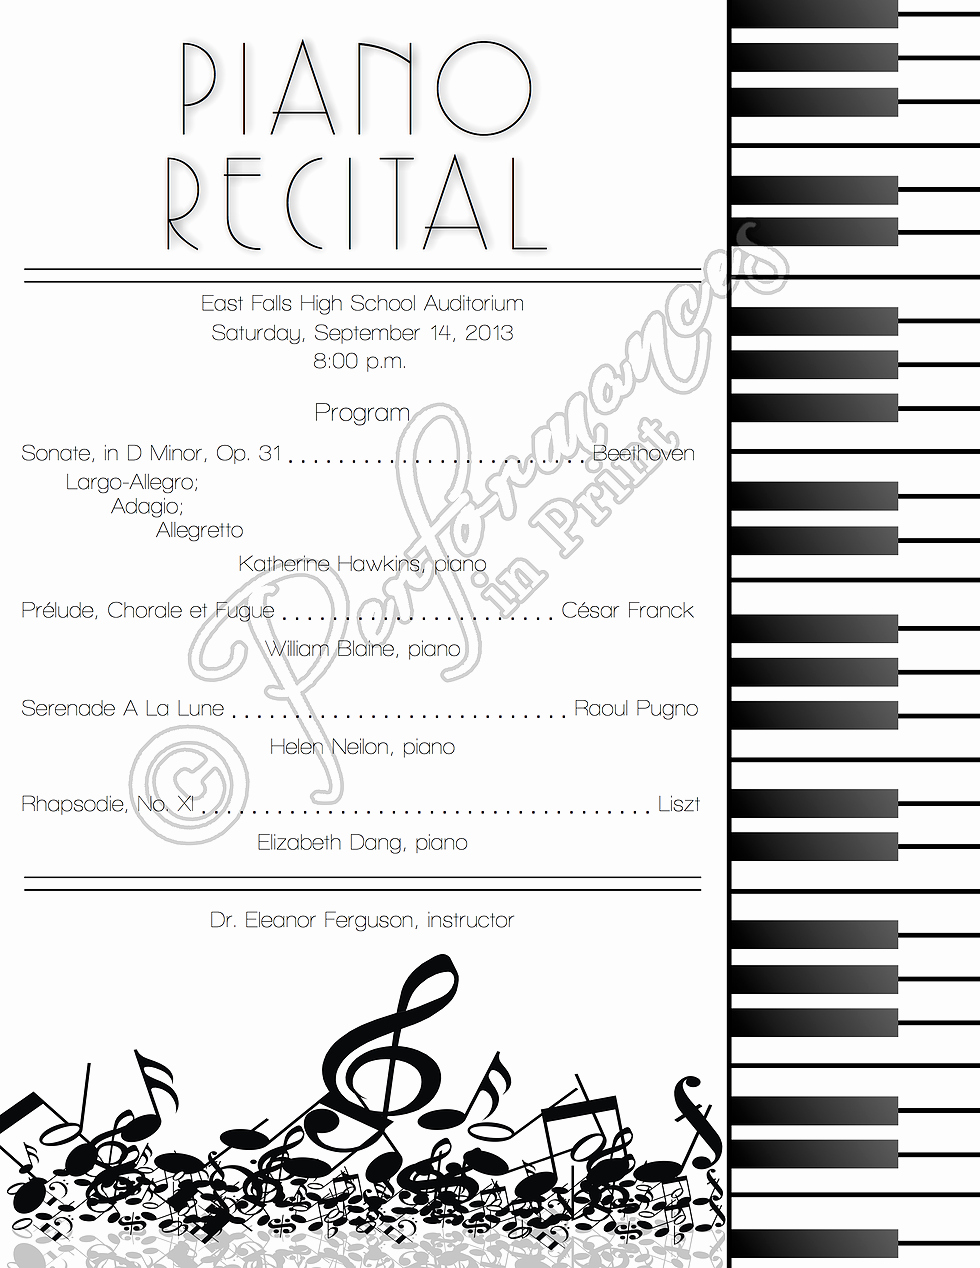 Concert Program Template Free Unique Piano Recital Concert Music Program